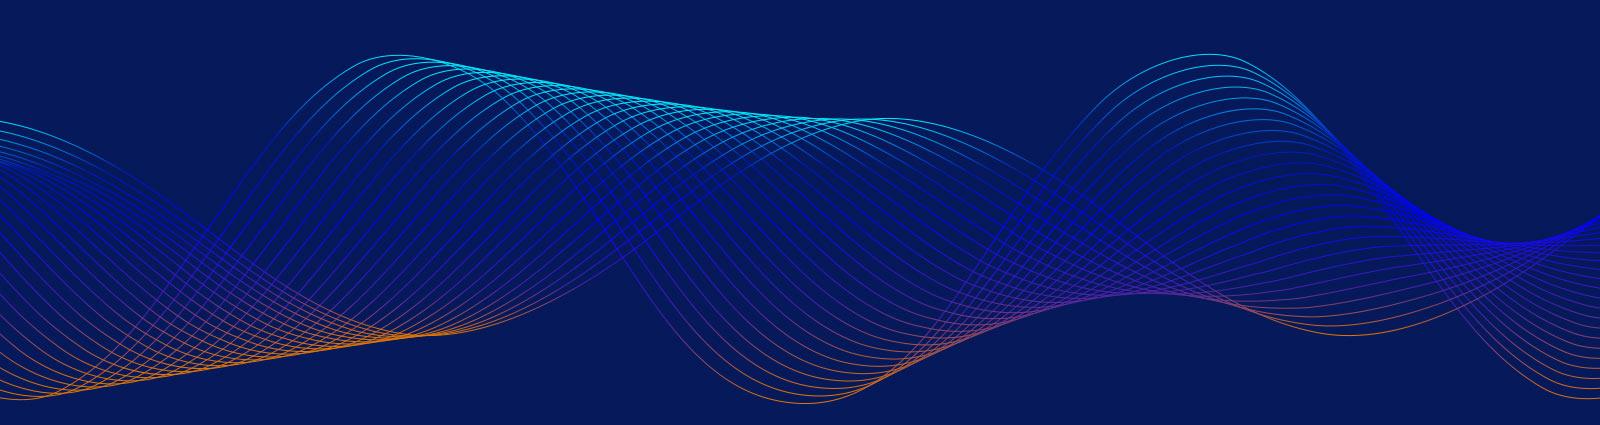 NYIIX-Requirements-Wavy-Lines-Graphic